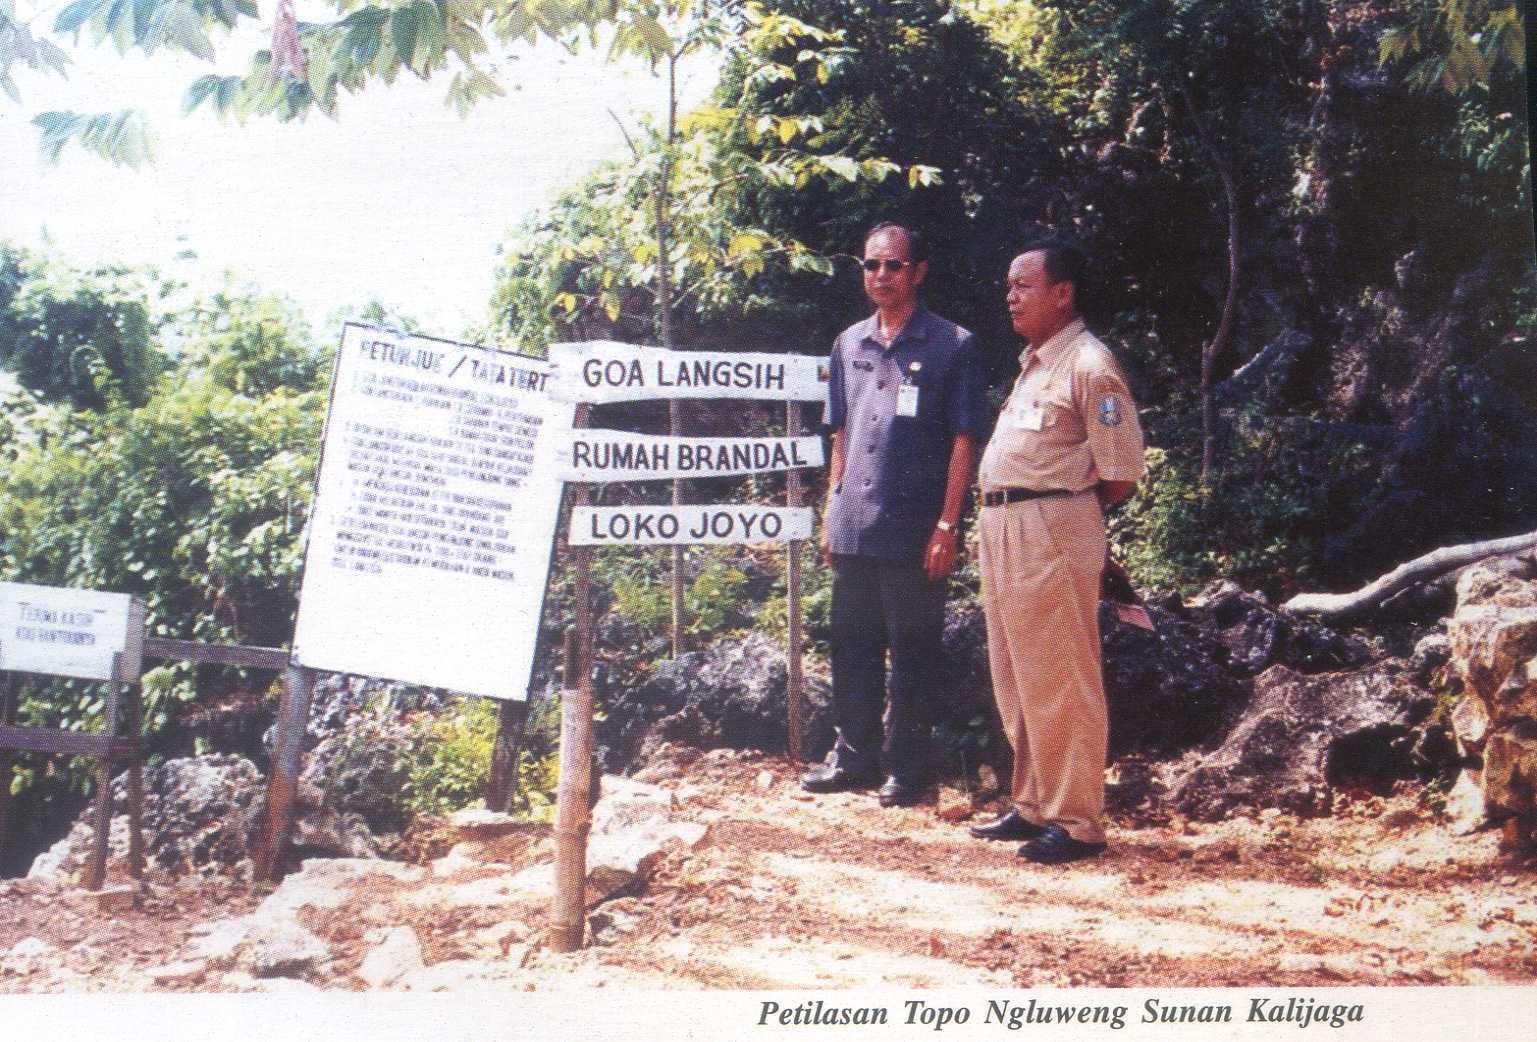 Bukit Surowiti Pusaka Jawatimuran Perkampungan Petilasan Sunan Kalijaga Kab Gresik